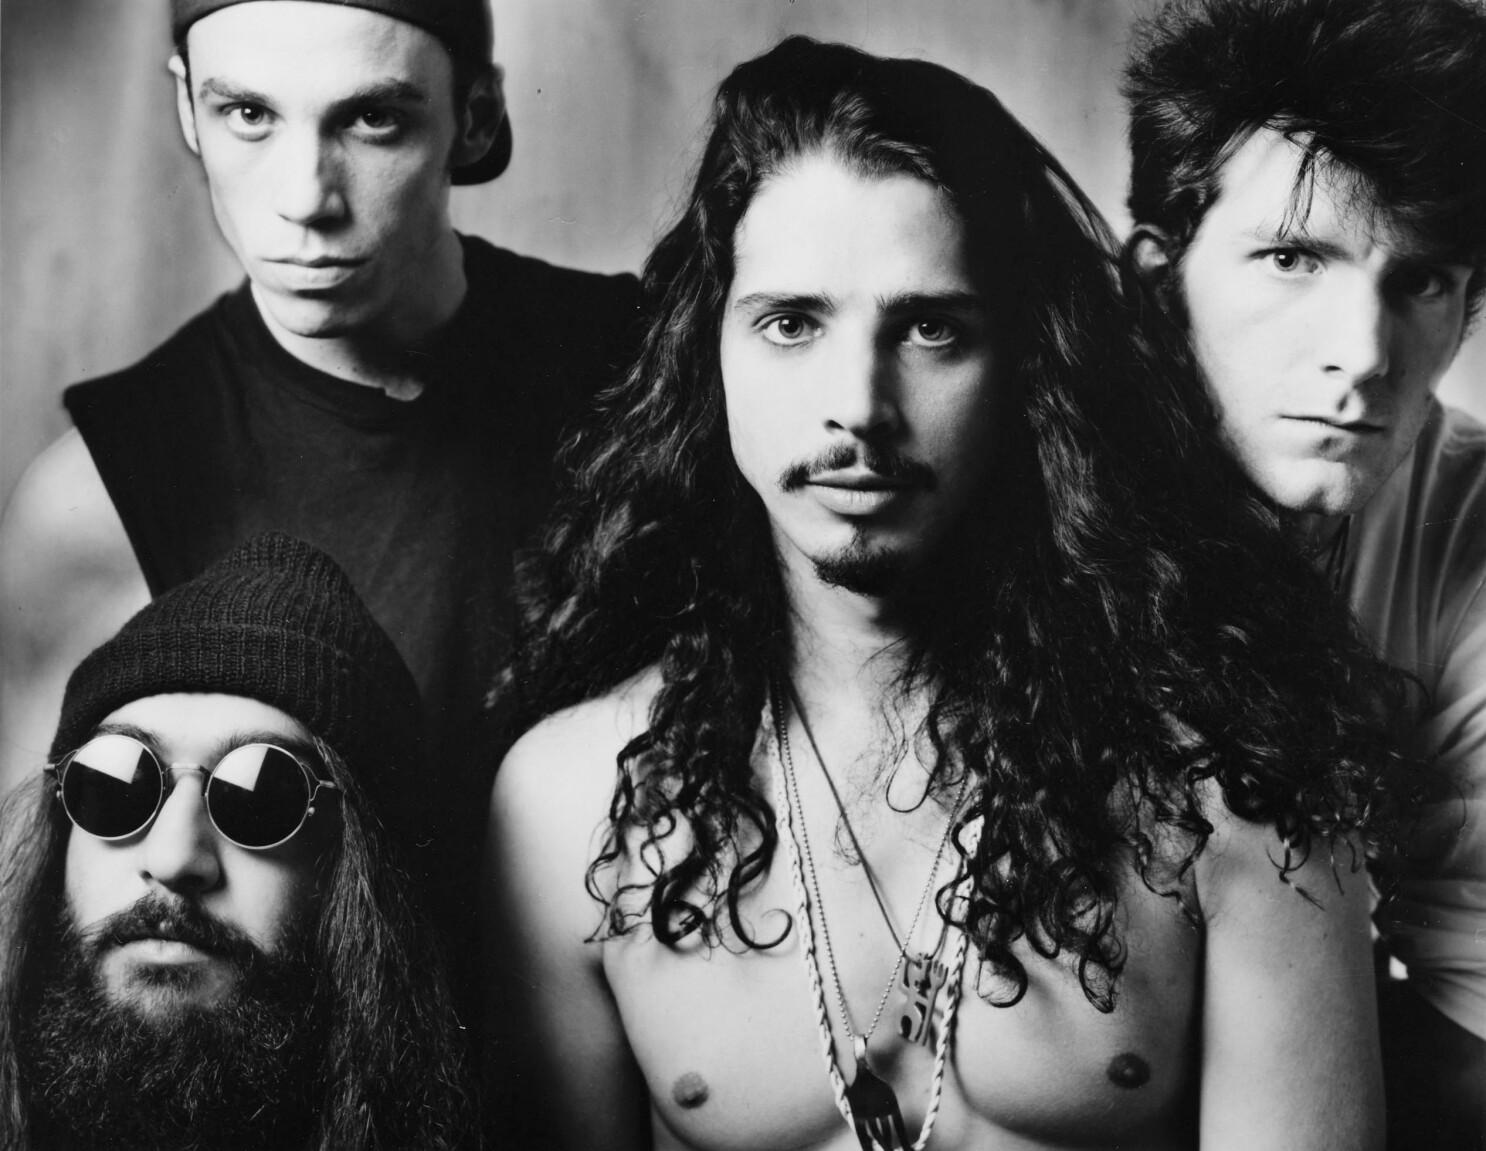 Soundgarden, Judas Priest, Whitney Houston, Notorious B.I.G. among 2020 Rock Hall of Fame nominees